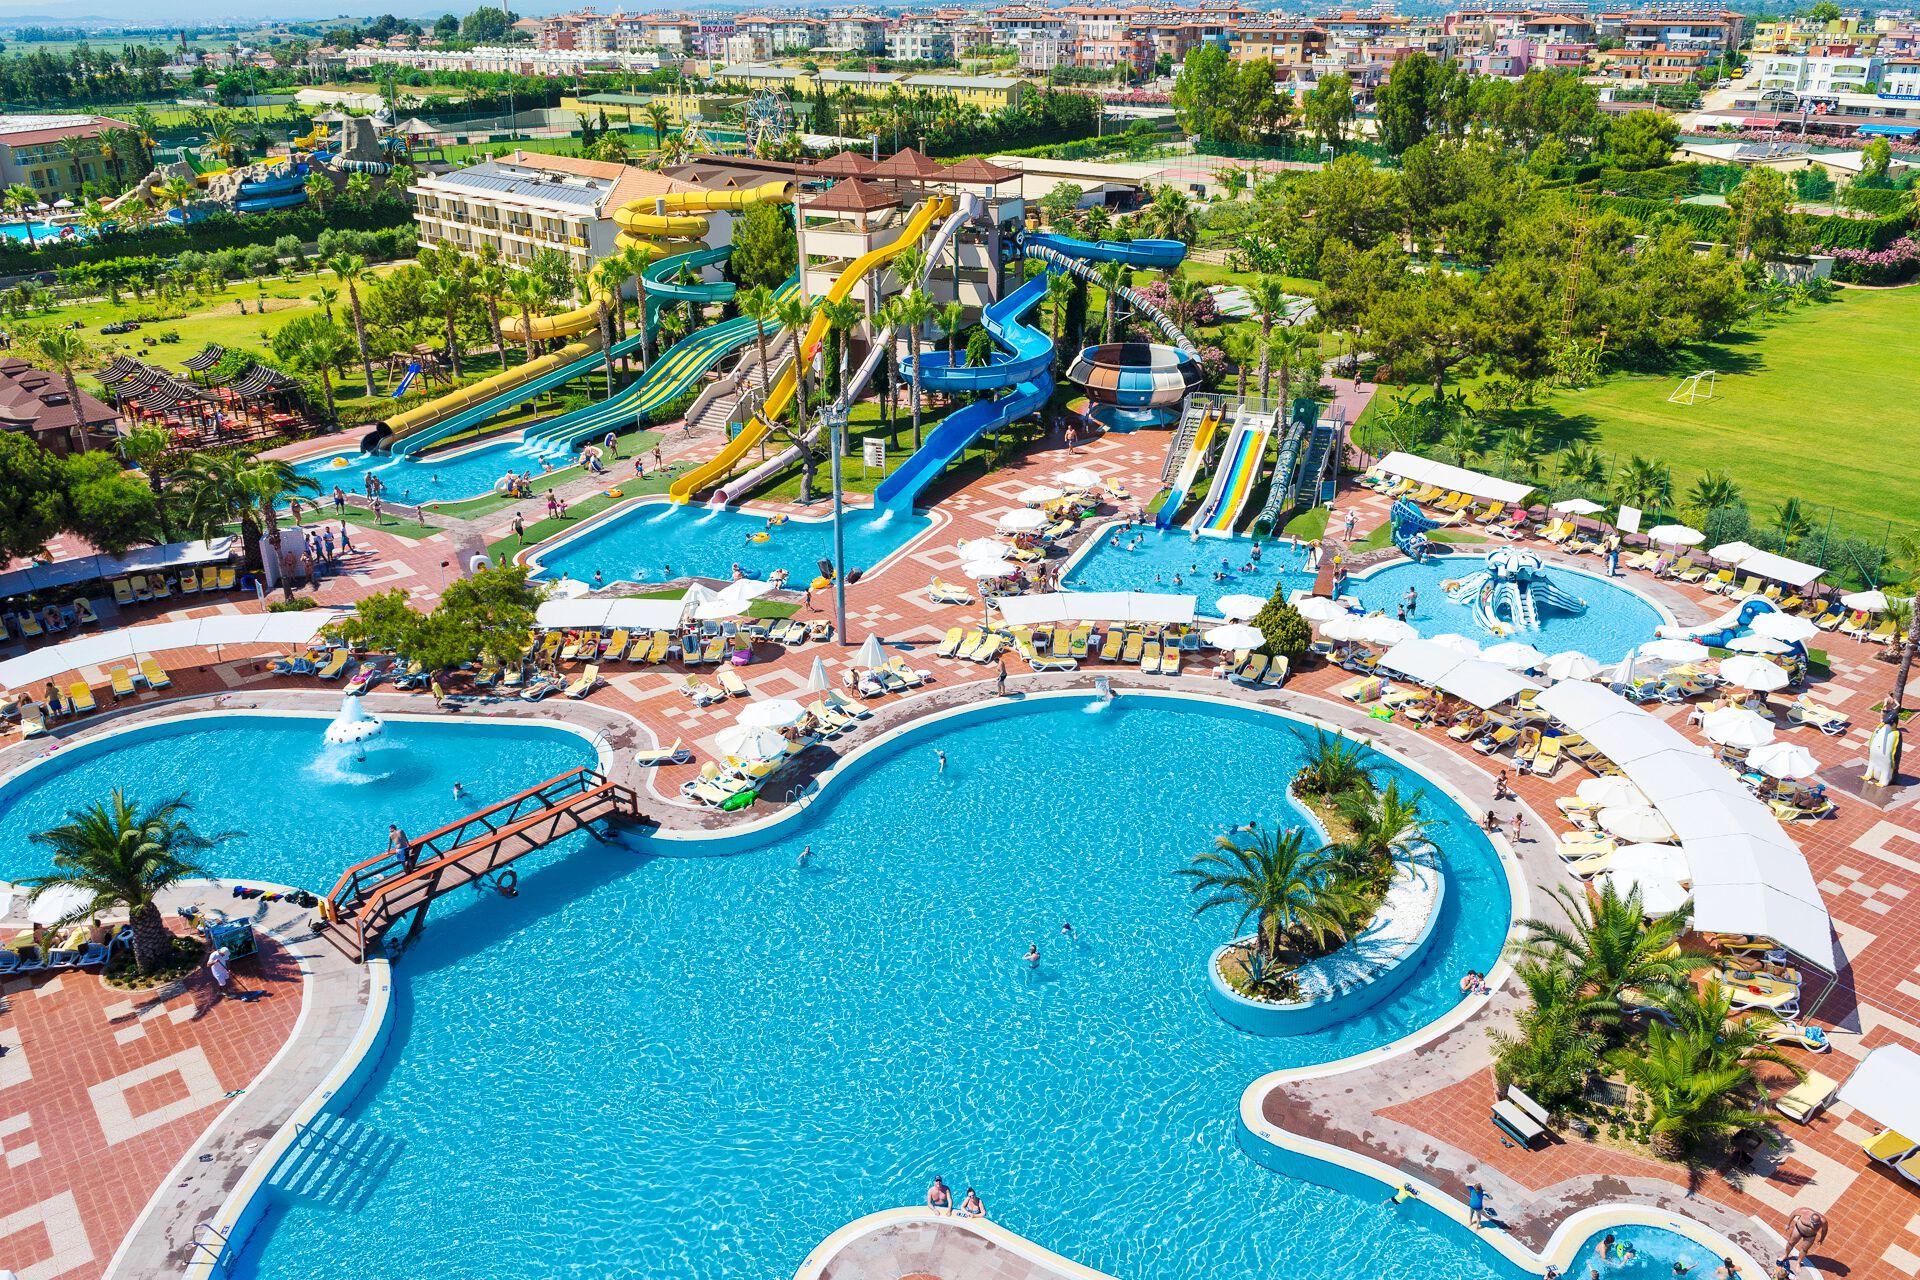 Turquie - Manavgat - Club-Hôtel Turan Prince World 4*